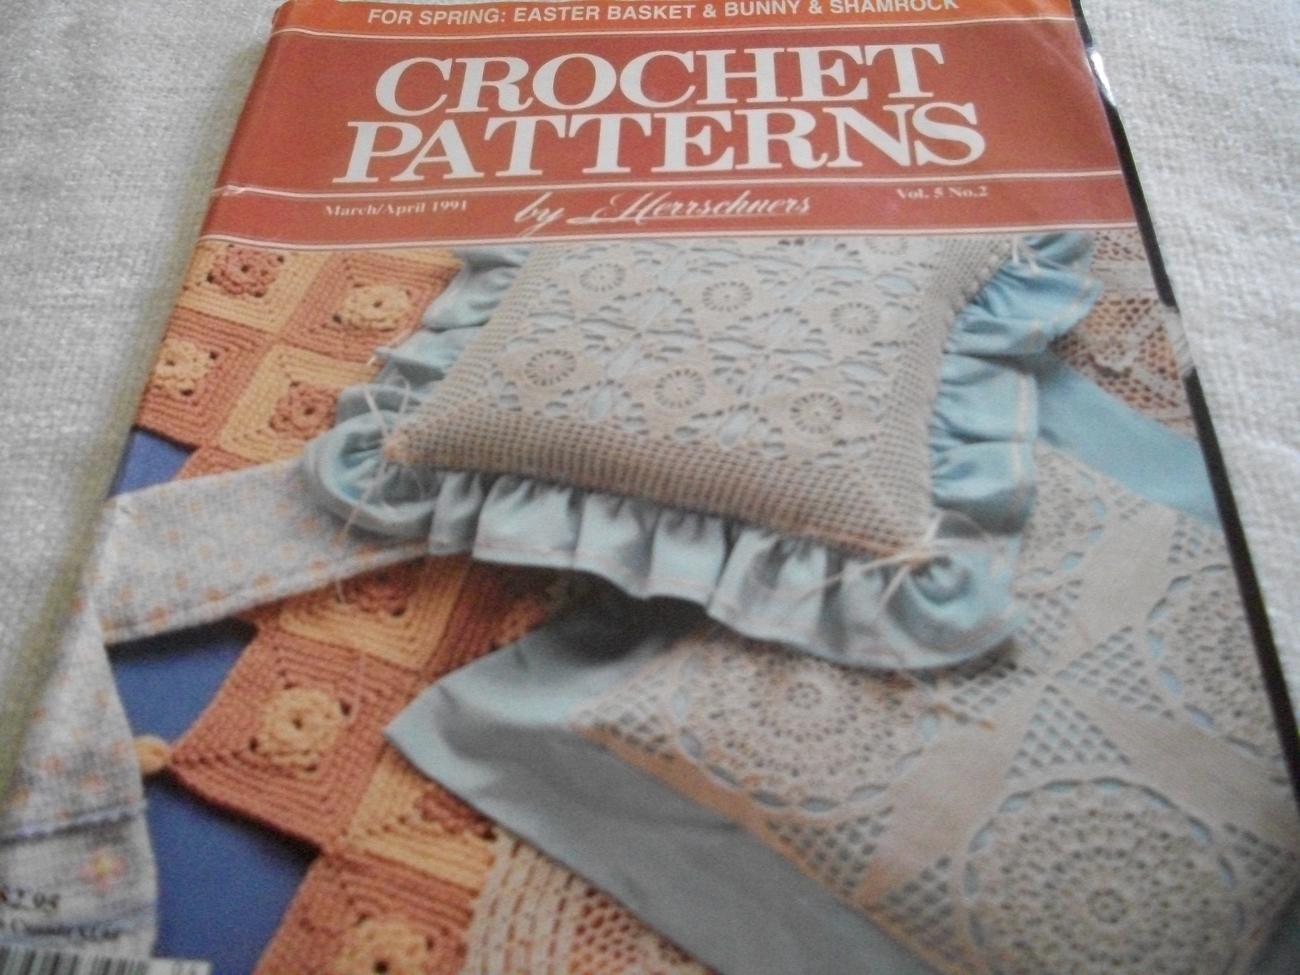 Crochet Patterns March/April 1991 Magazine - $5.00